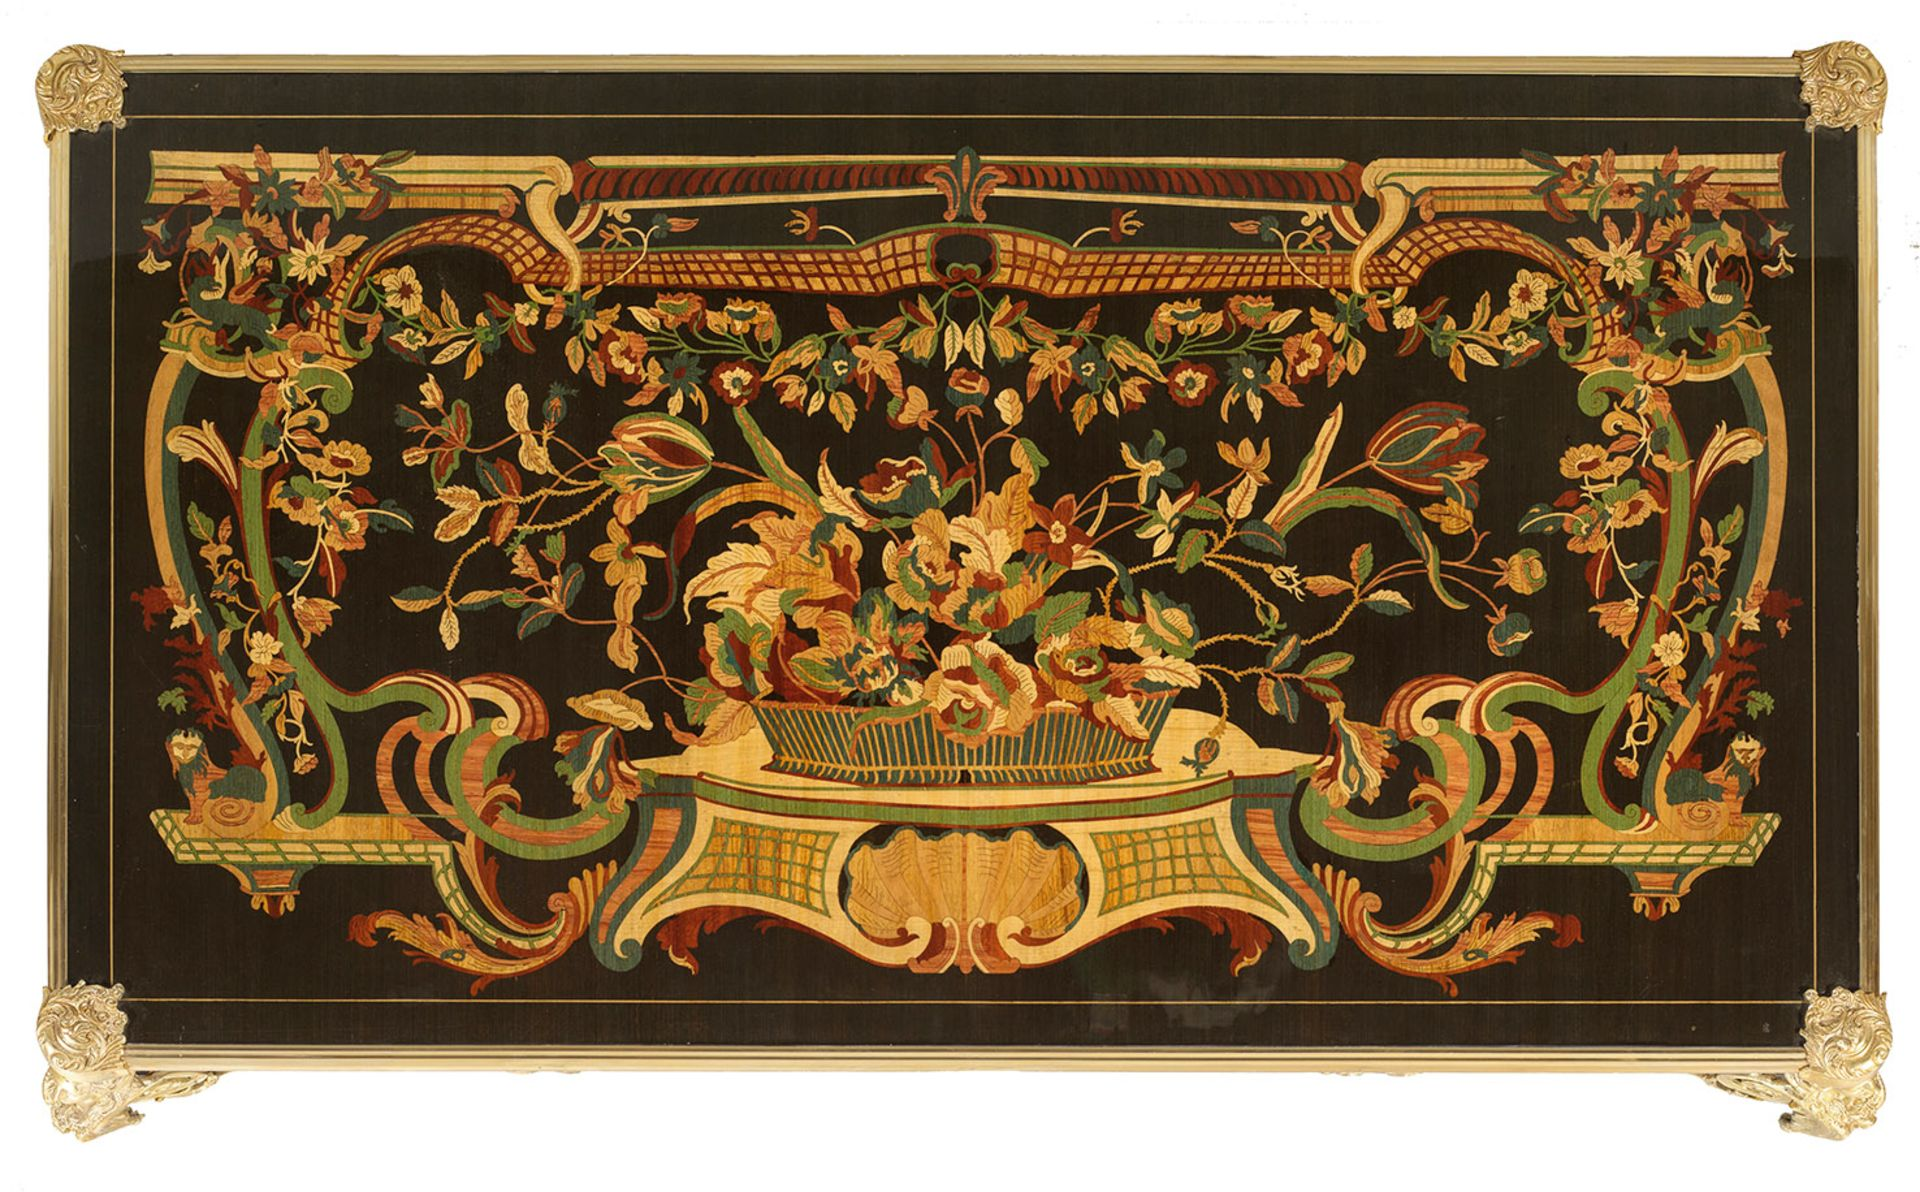 Repräsentatives Bureau plat im Louis XV-Stil - Bild 2 aus 2